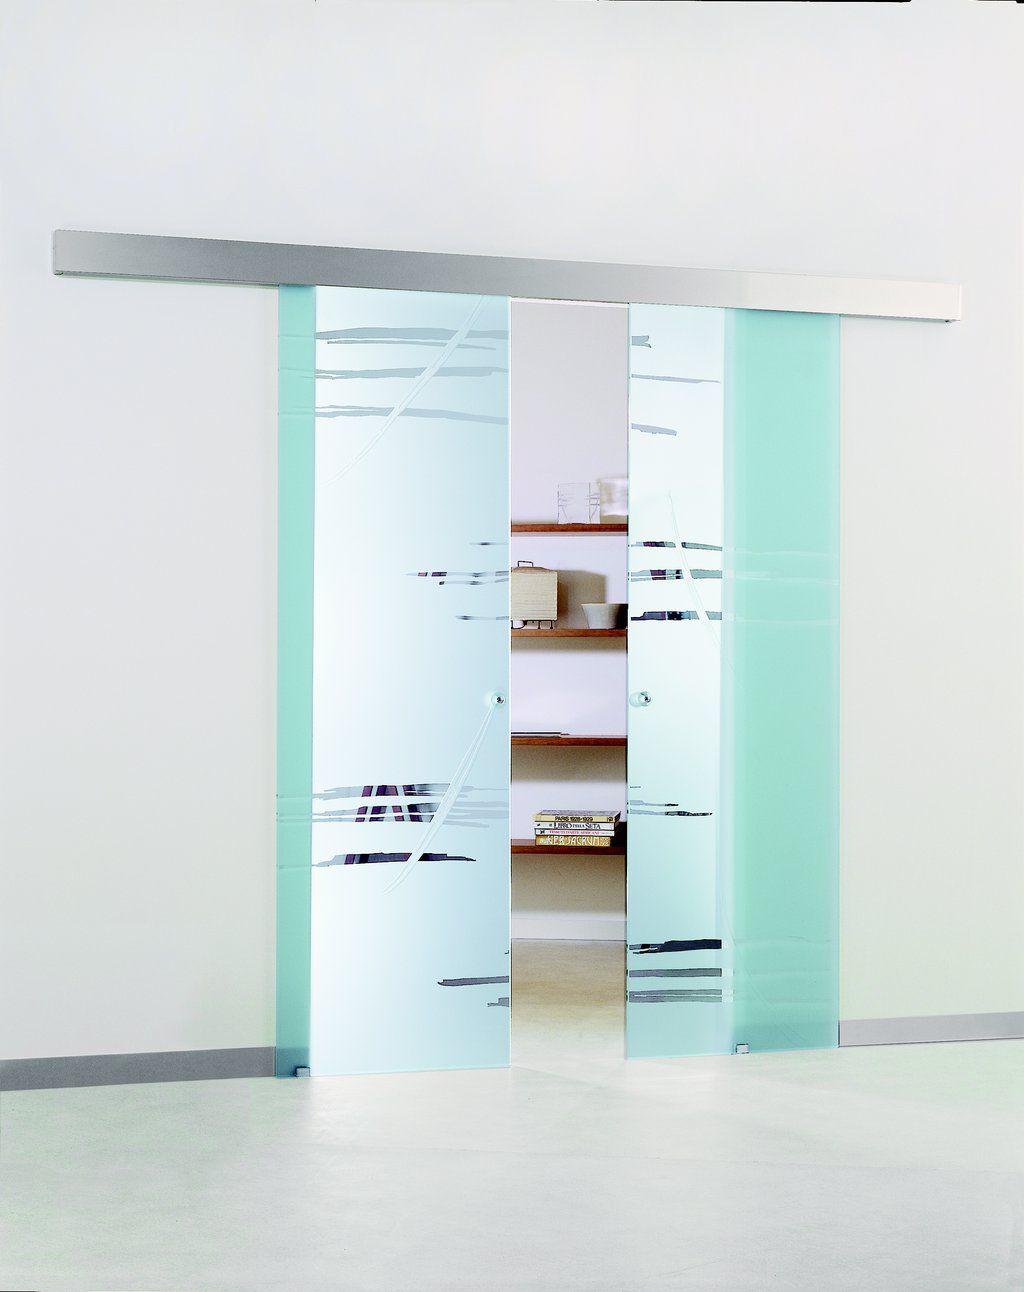 etched frameless glass sliding door modernus - Wall Mount Sliding Doors Interior